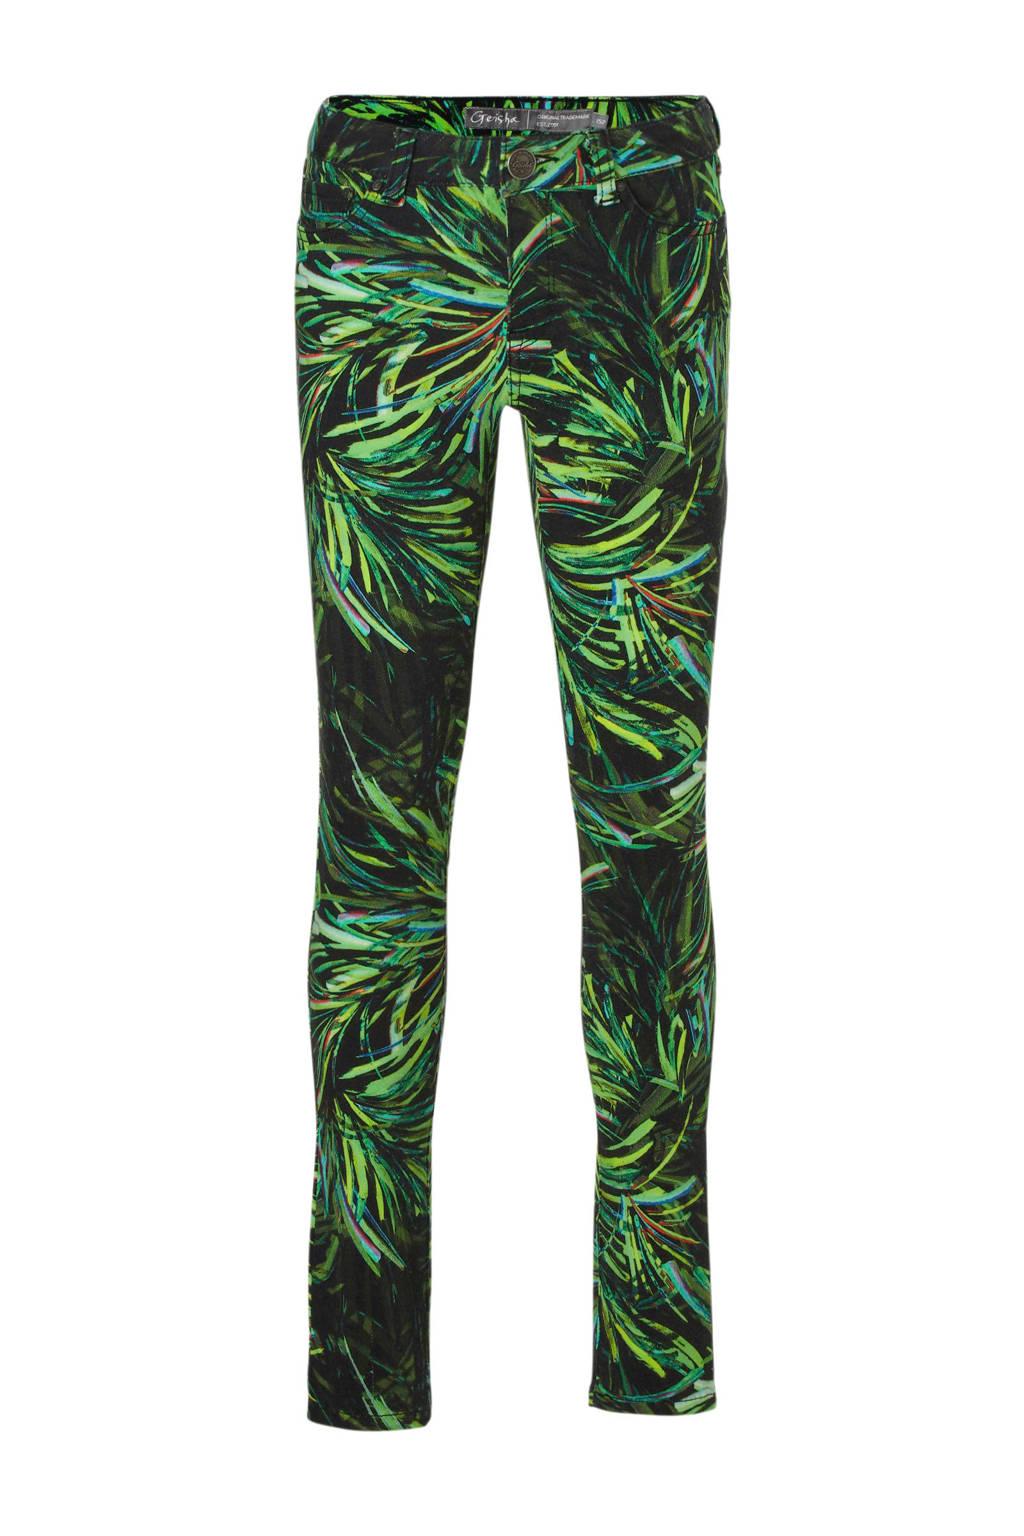 Geisha skinny fit broek met bladdessin zwart, Groen/zwart